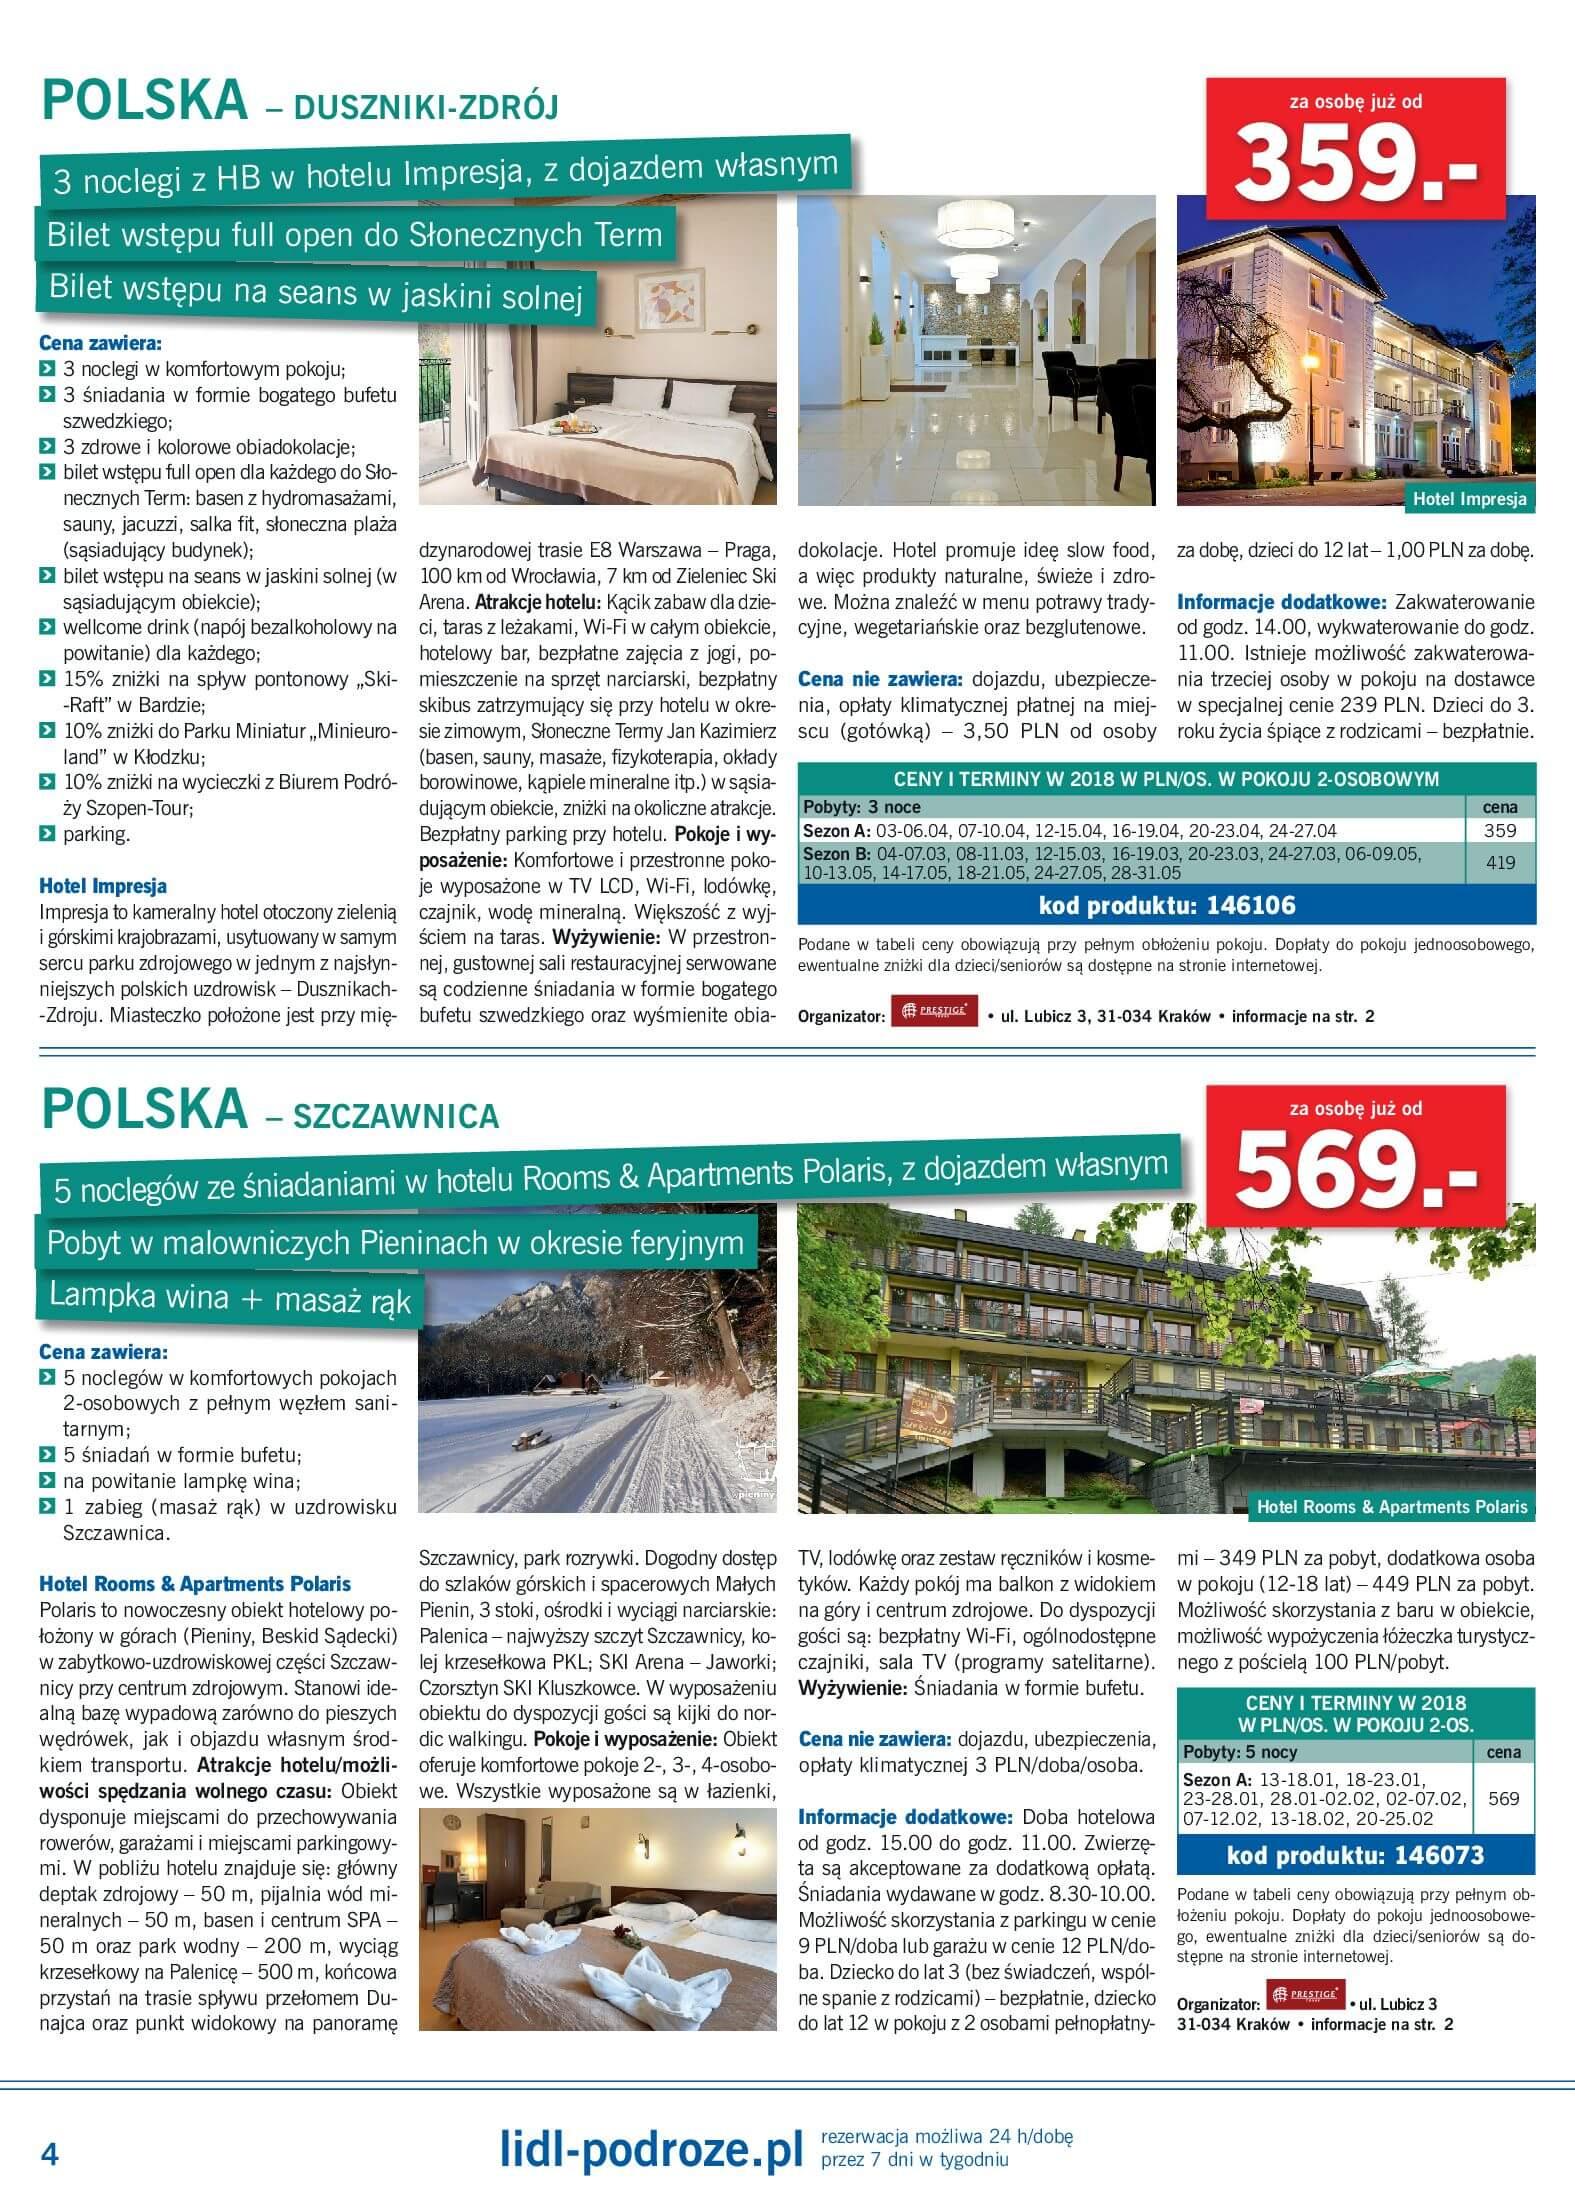 Gazetka Lidl - Lidl podróże-31.12.2017-28.01.2018-page-4